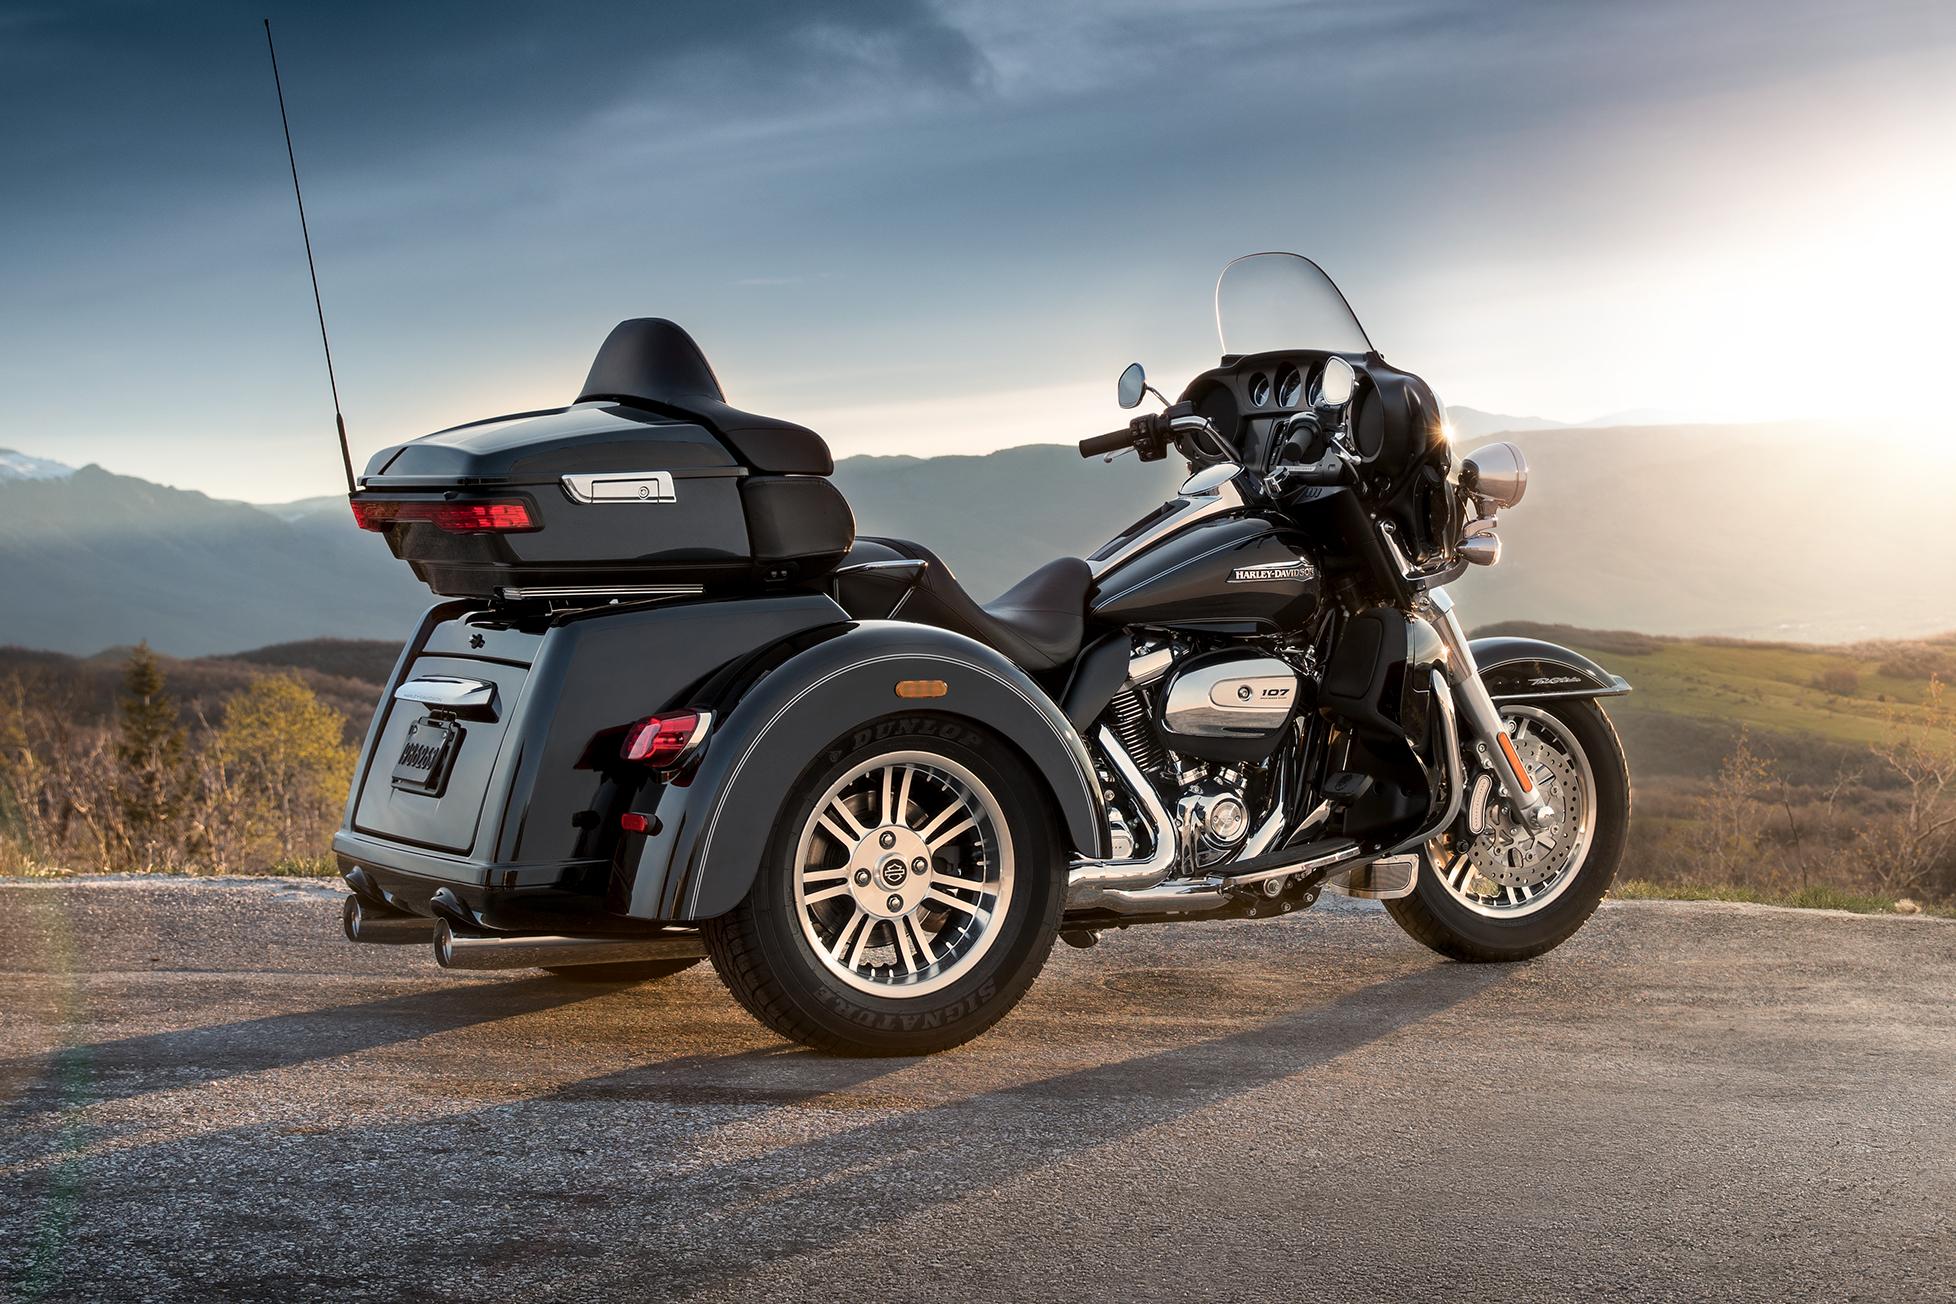 tri harley davidson motorcycles – idee per l'immagine del motociclo